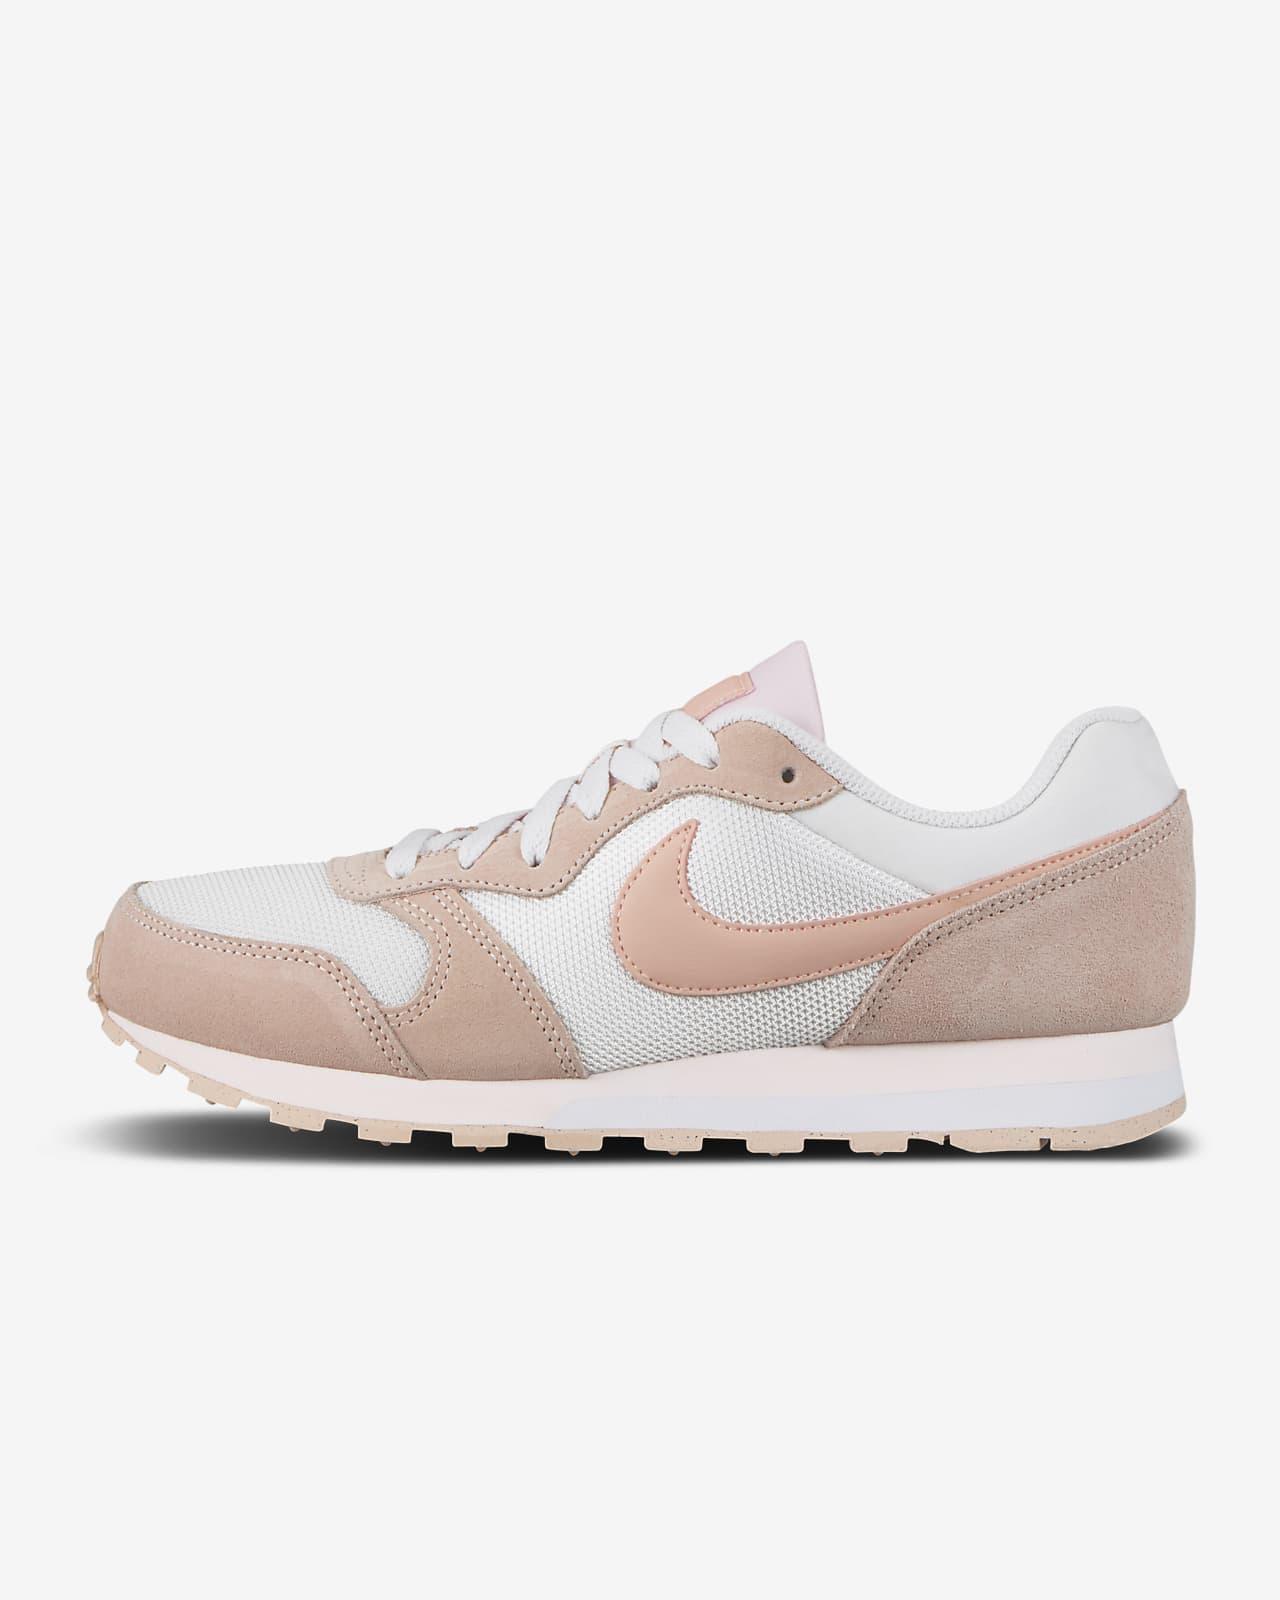 Nike MD Runner 2 Women's Shoe. Nike AT